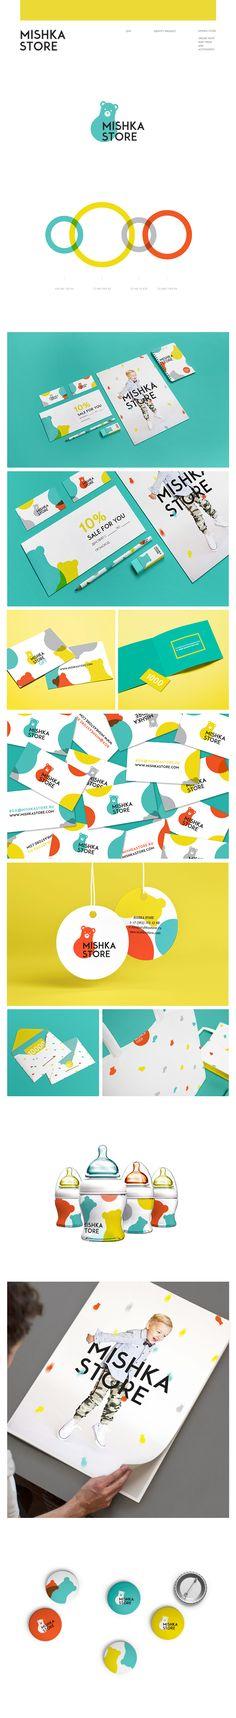 Fivestar Branding Agency – Business Branding and Web Design for Small Business Owners Branding Agency, Kids Branding, Business Branding, Logo Branding, Brand Identity Design, Graphic Design Branding, Corporate Design, Logo Design, Web Design